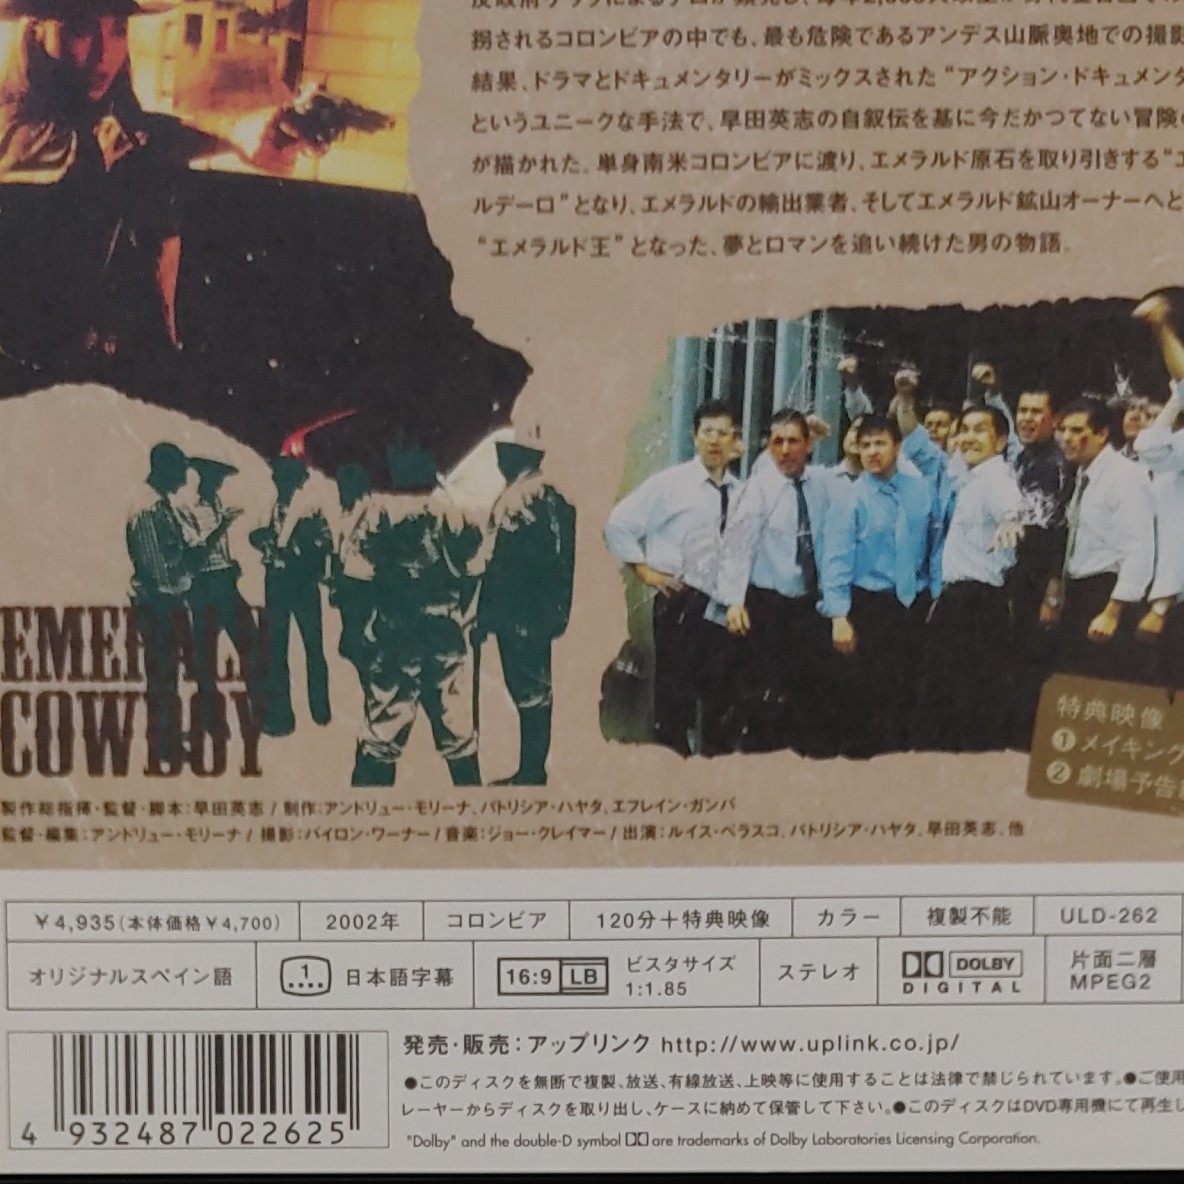 DVD エメラルド・カウボーイ